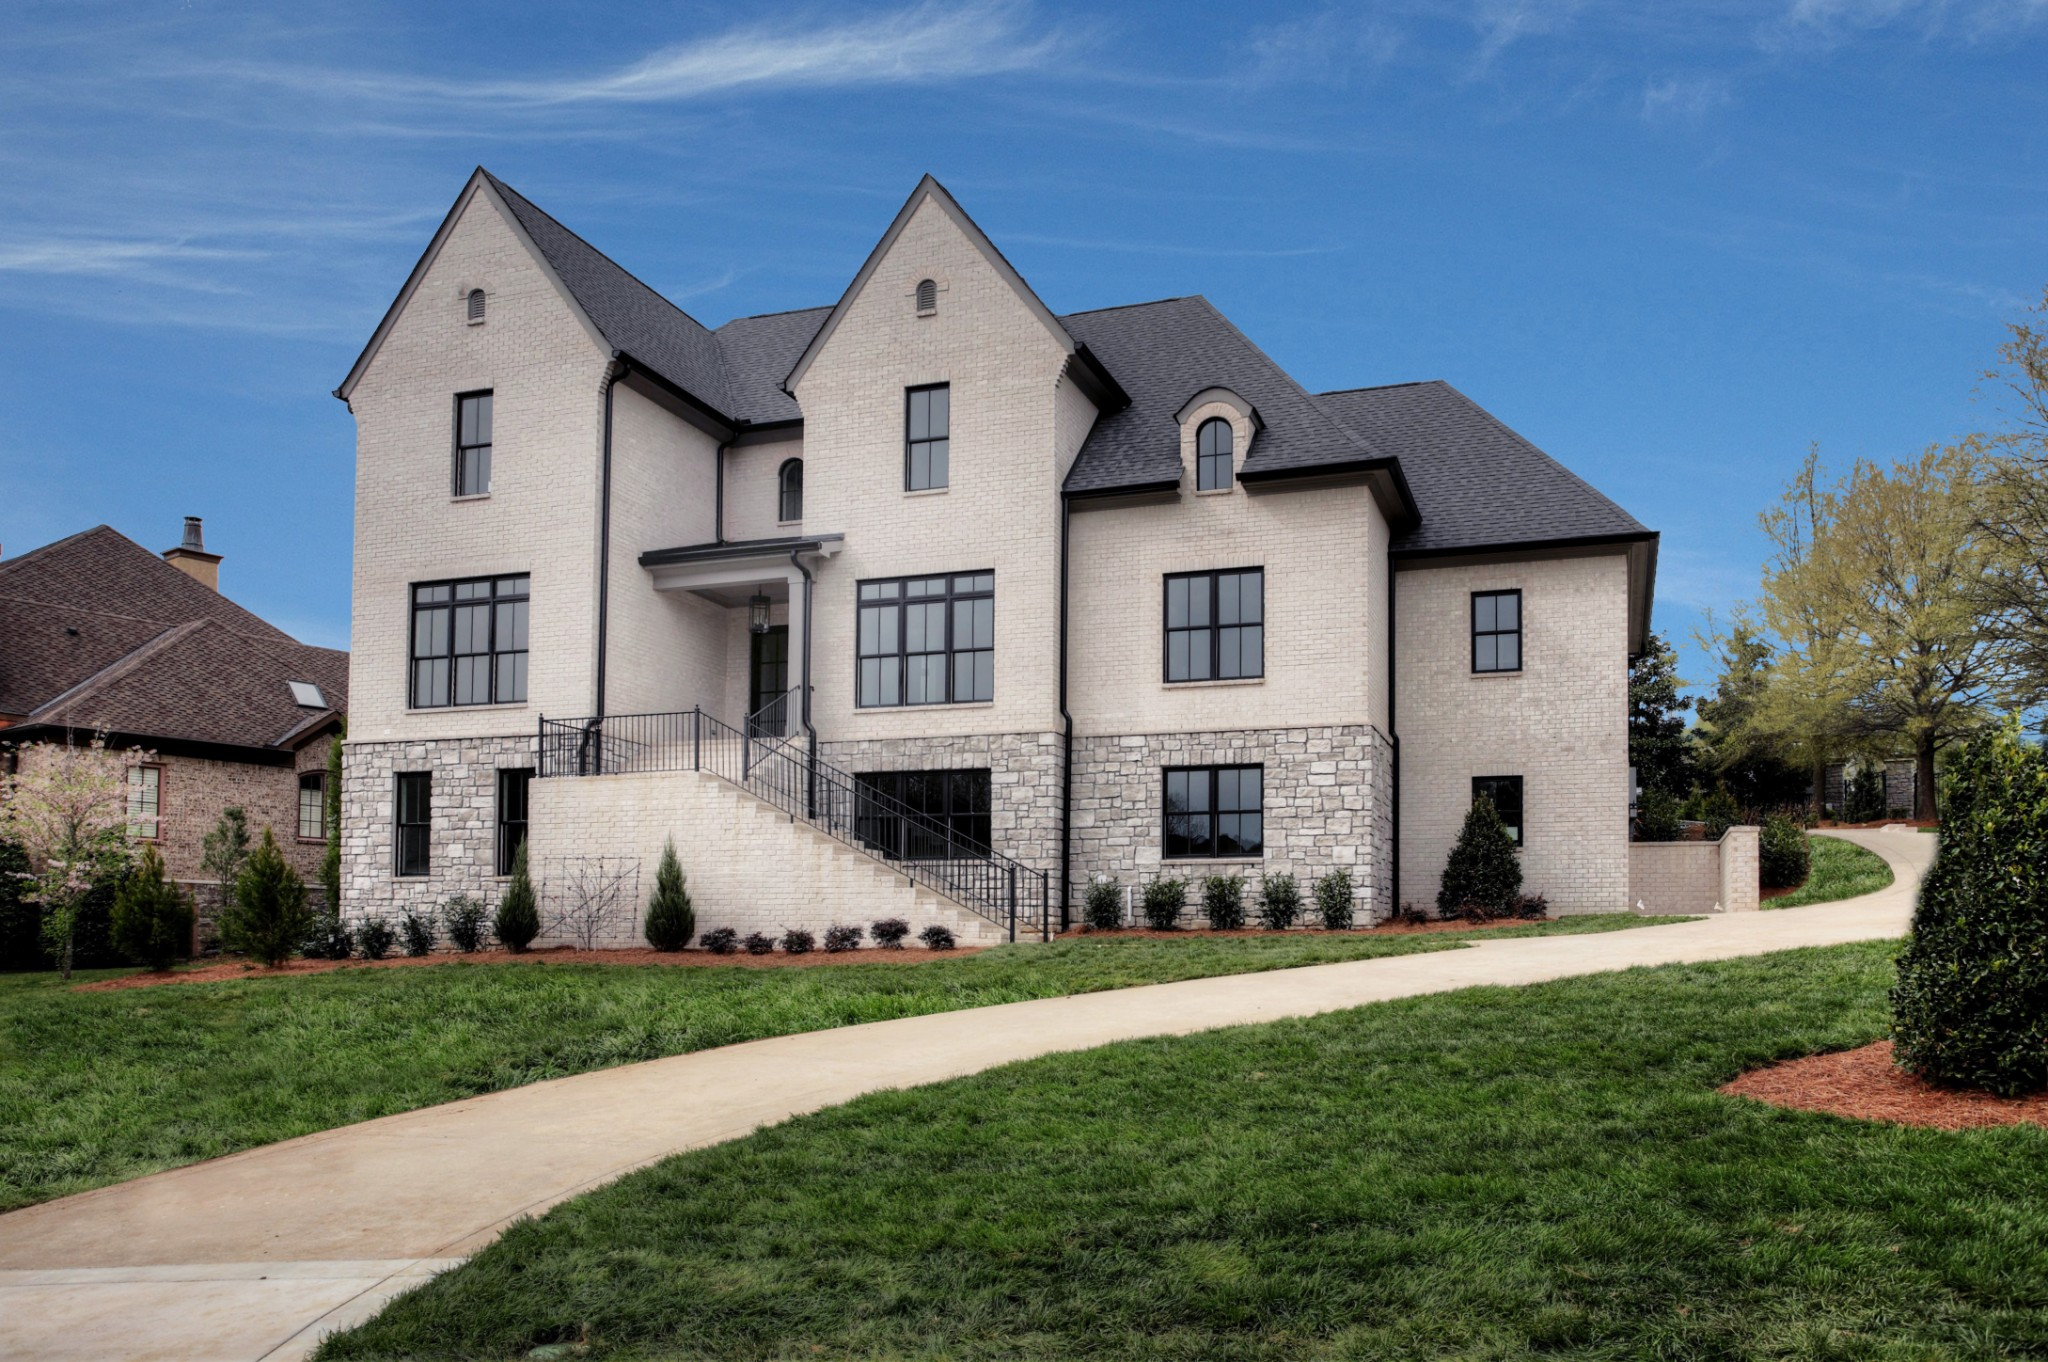 9540 Sunbeam Ct, Brentwood, TN 37027 - Brentwood, TN real estate listing